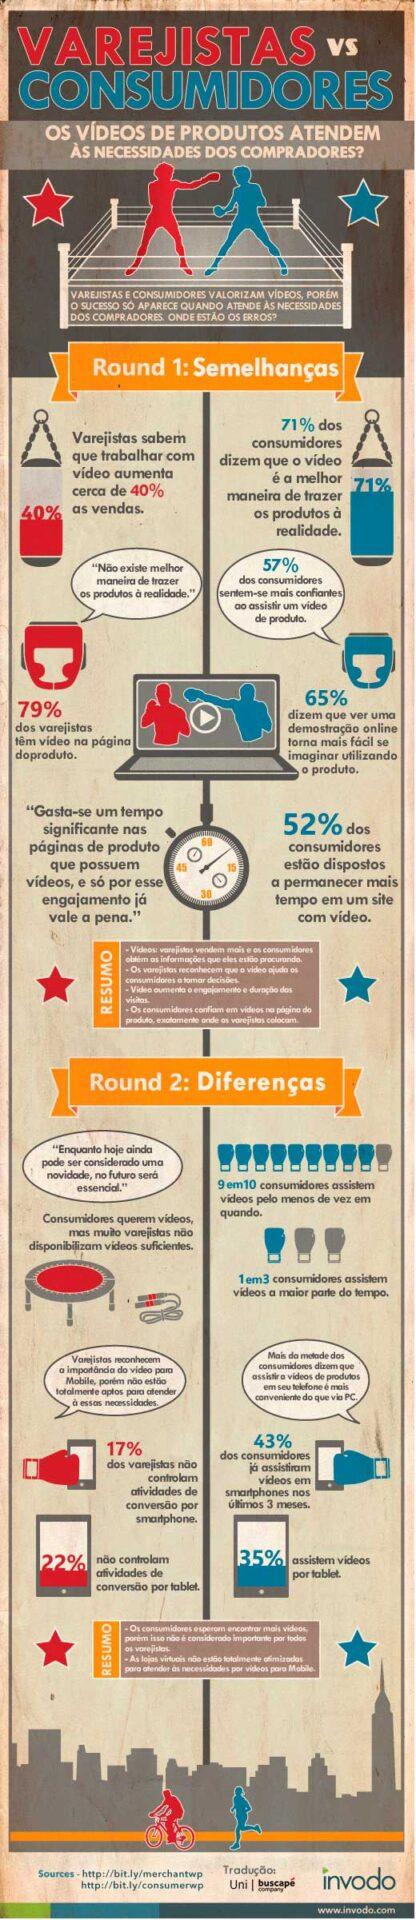 Infográfico: Vídeos de produtos - Varejistas vs Consumidores